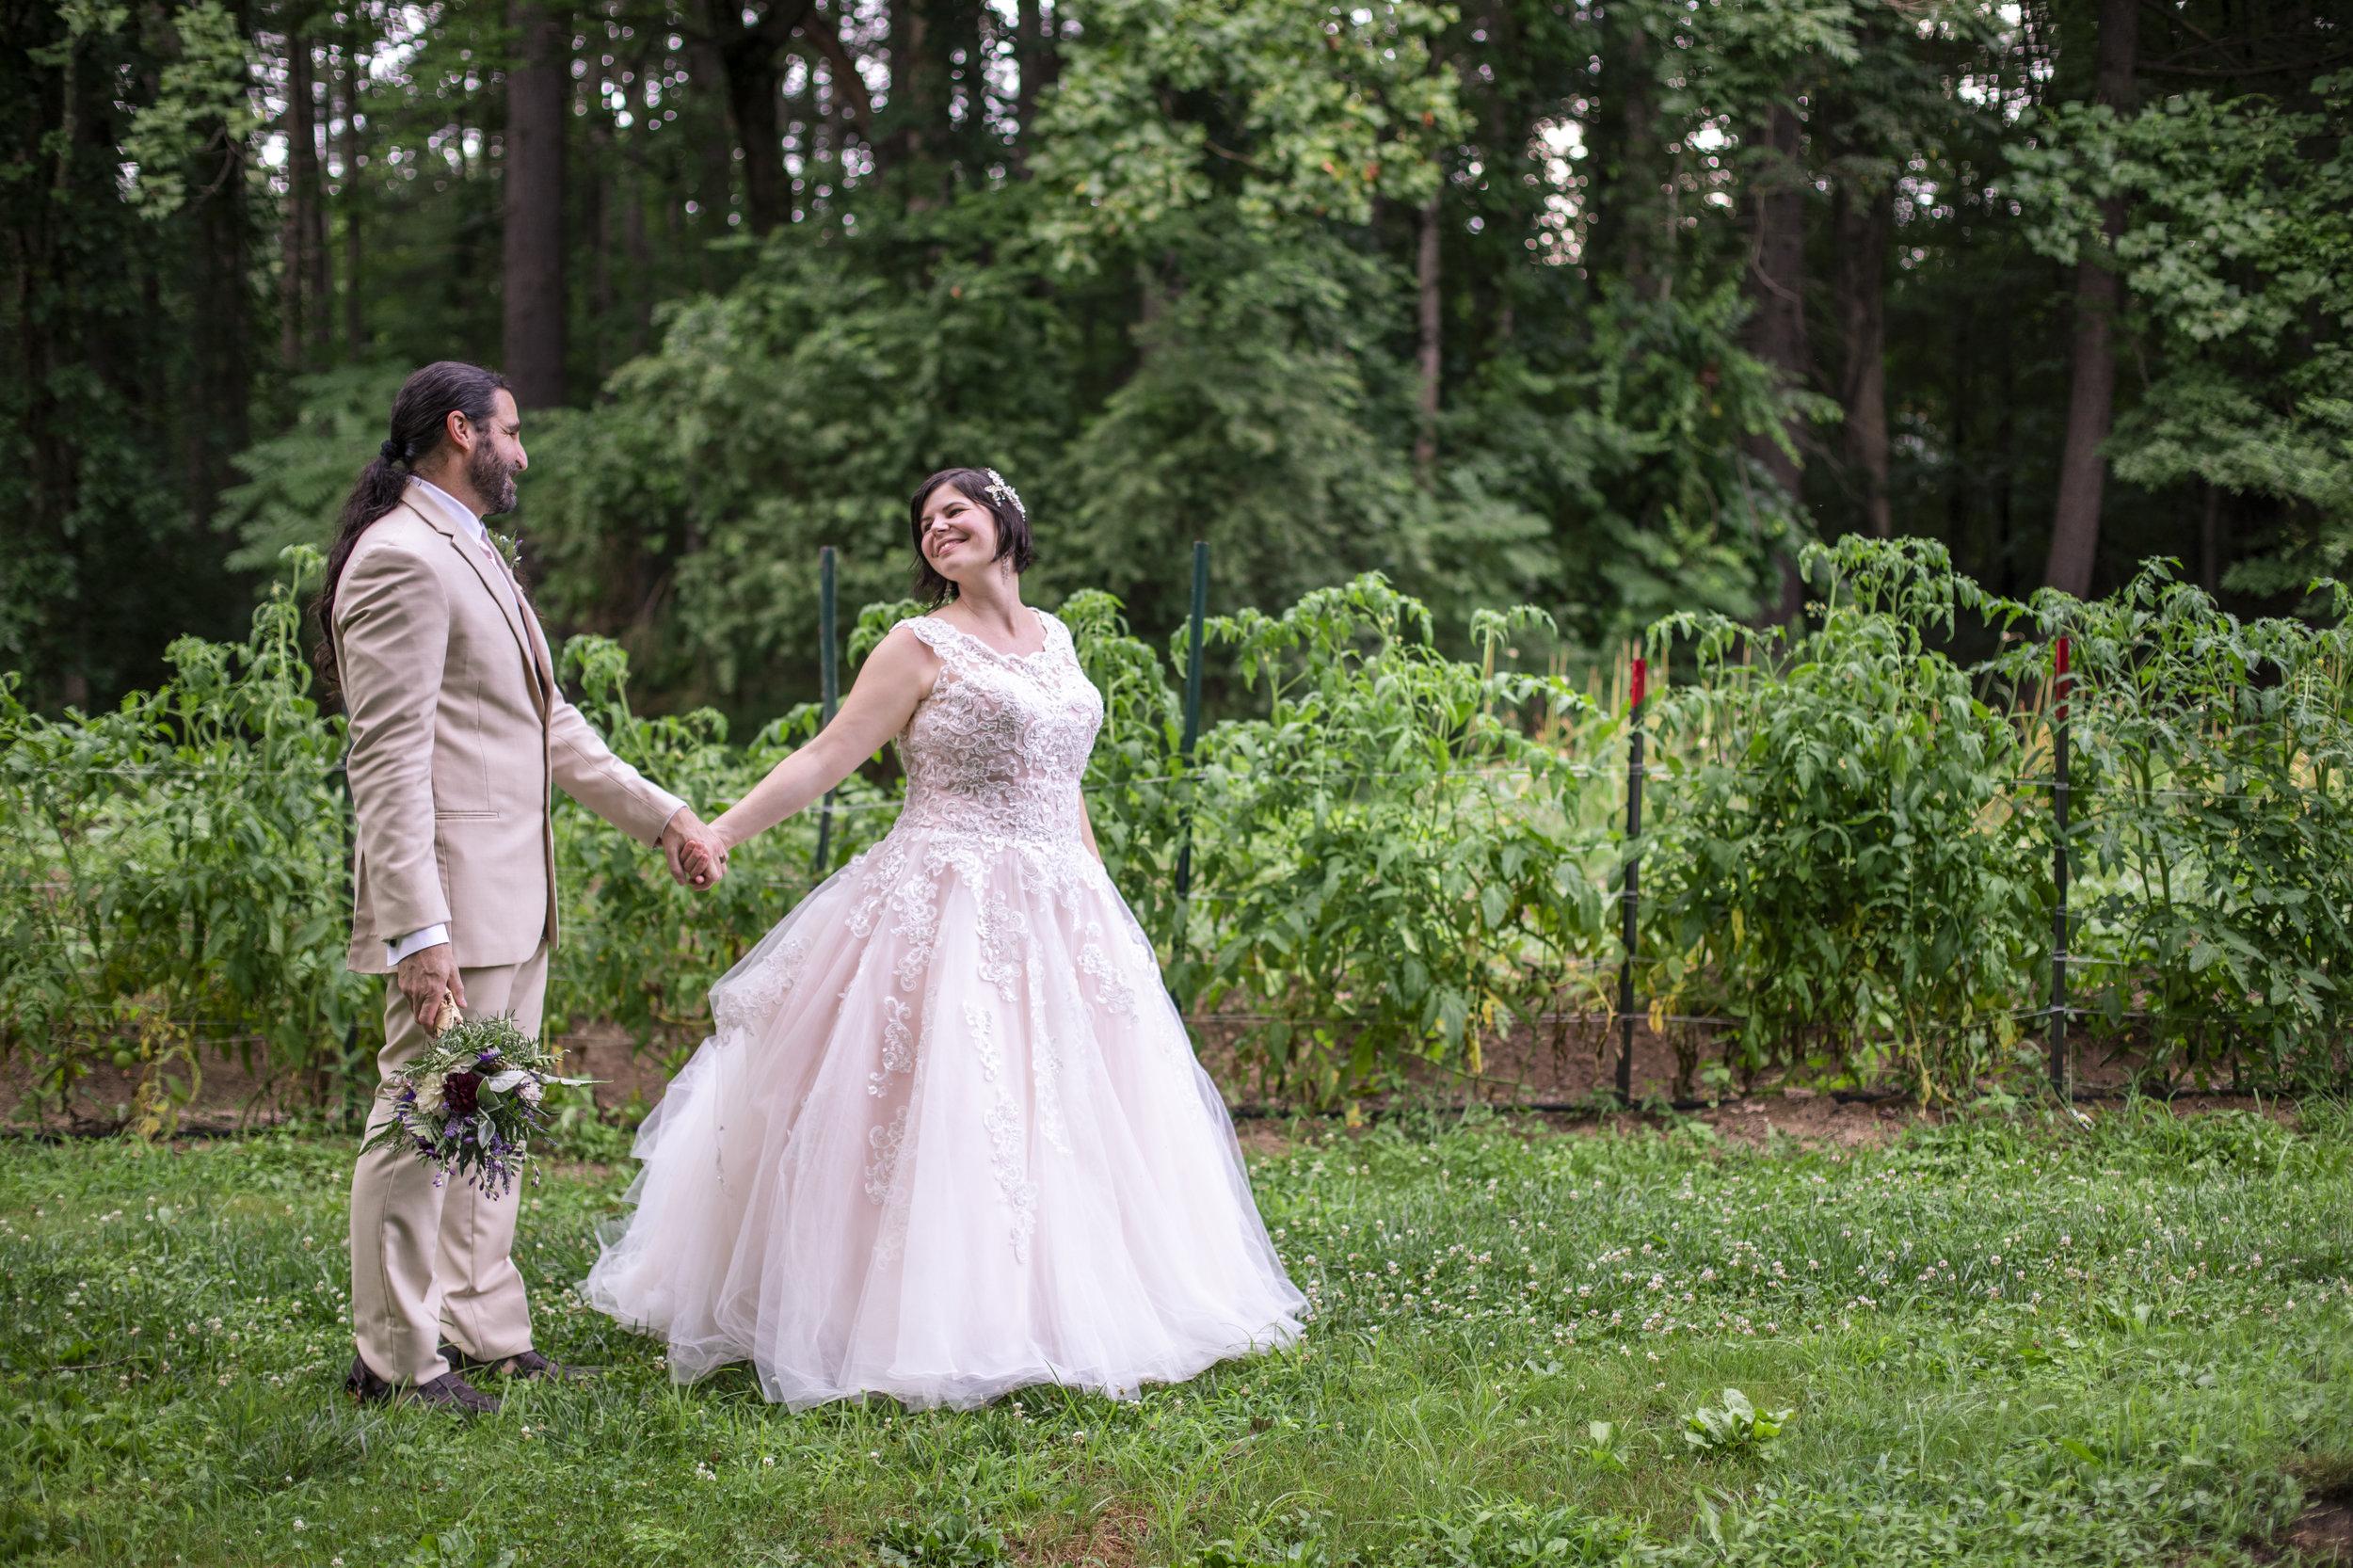 Avyanna and Phoenix Wedding- Photos by Studio Misha-203.jpg